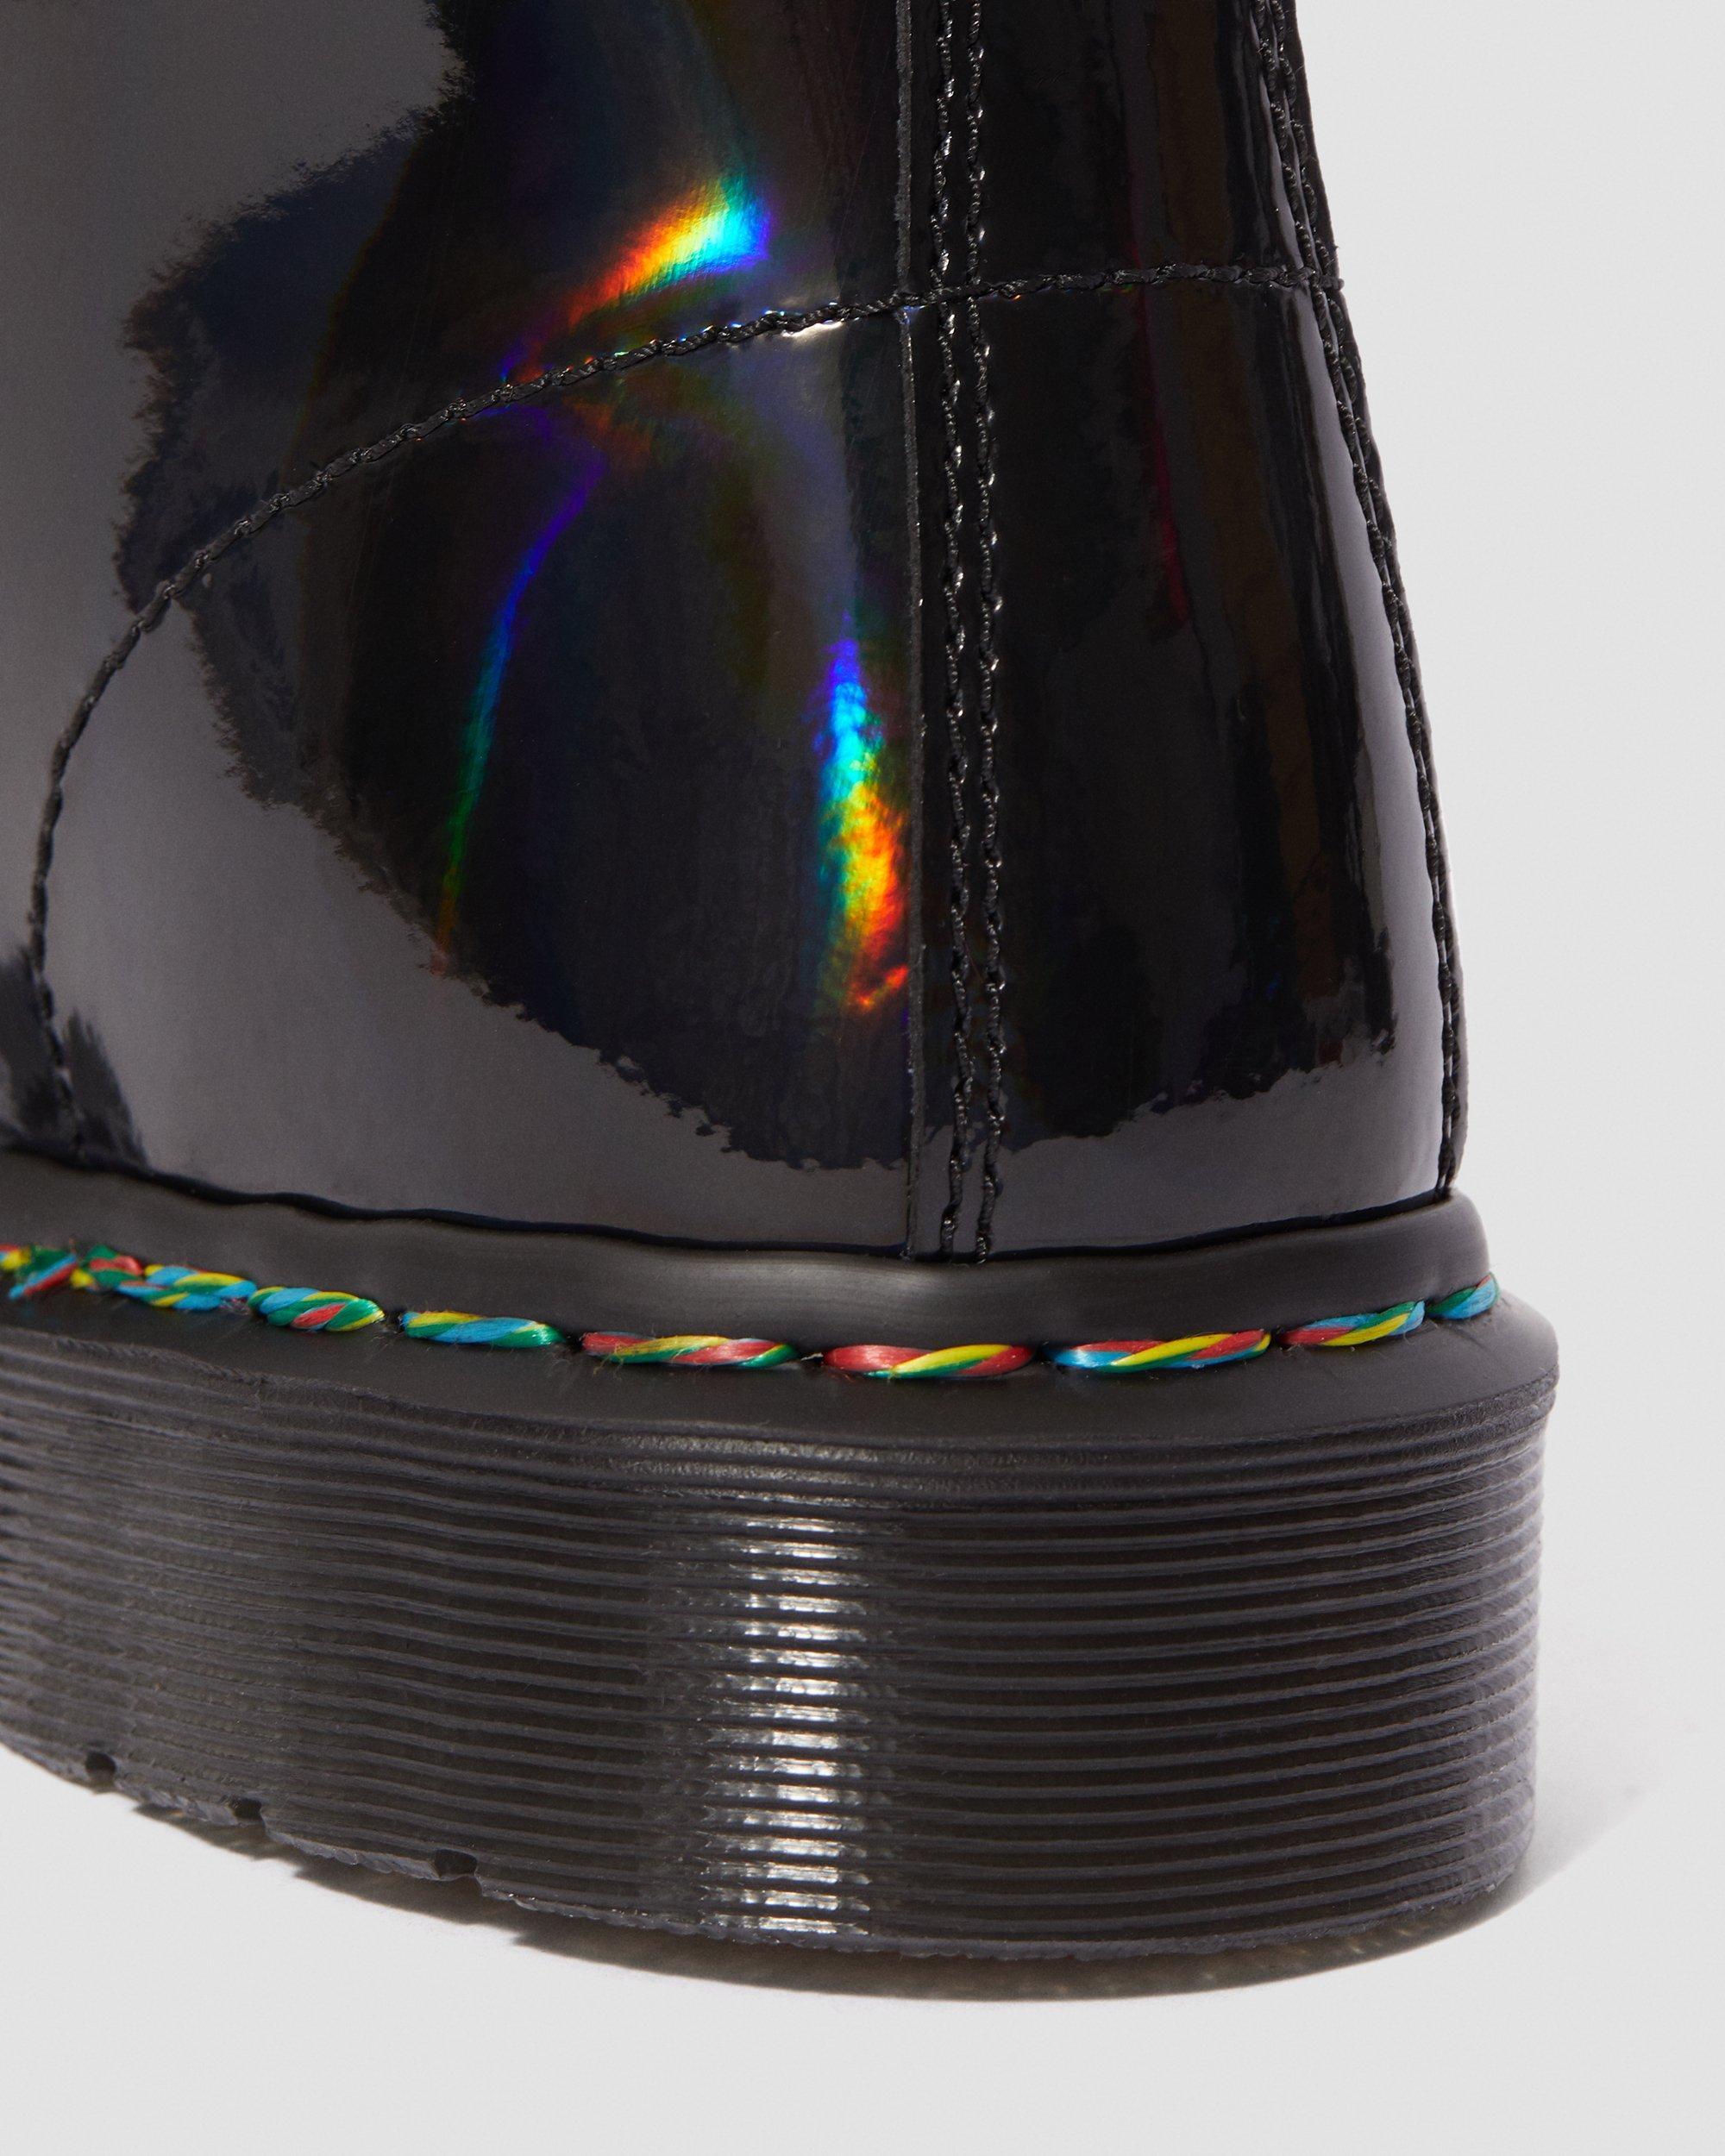 dr martens 1460 rainbow